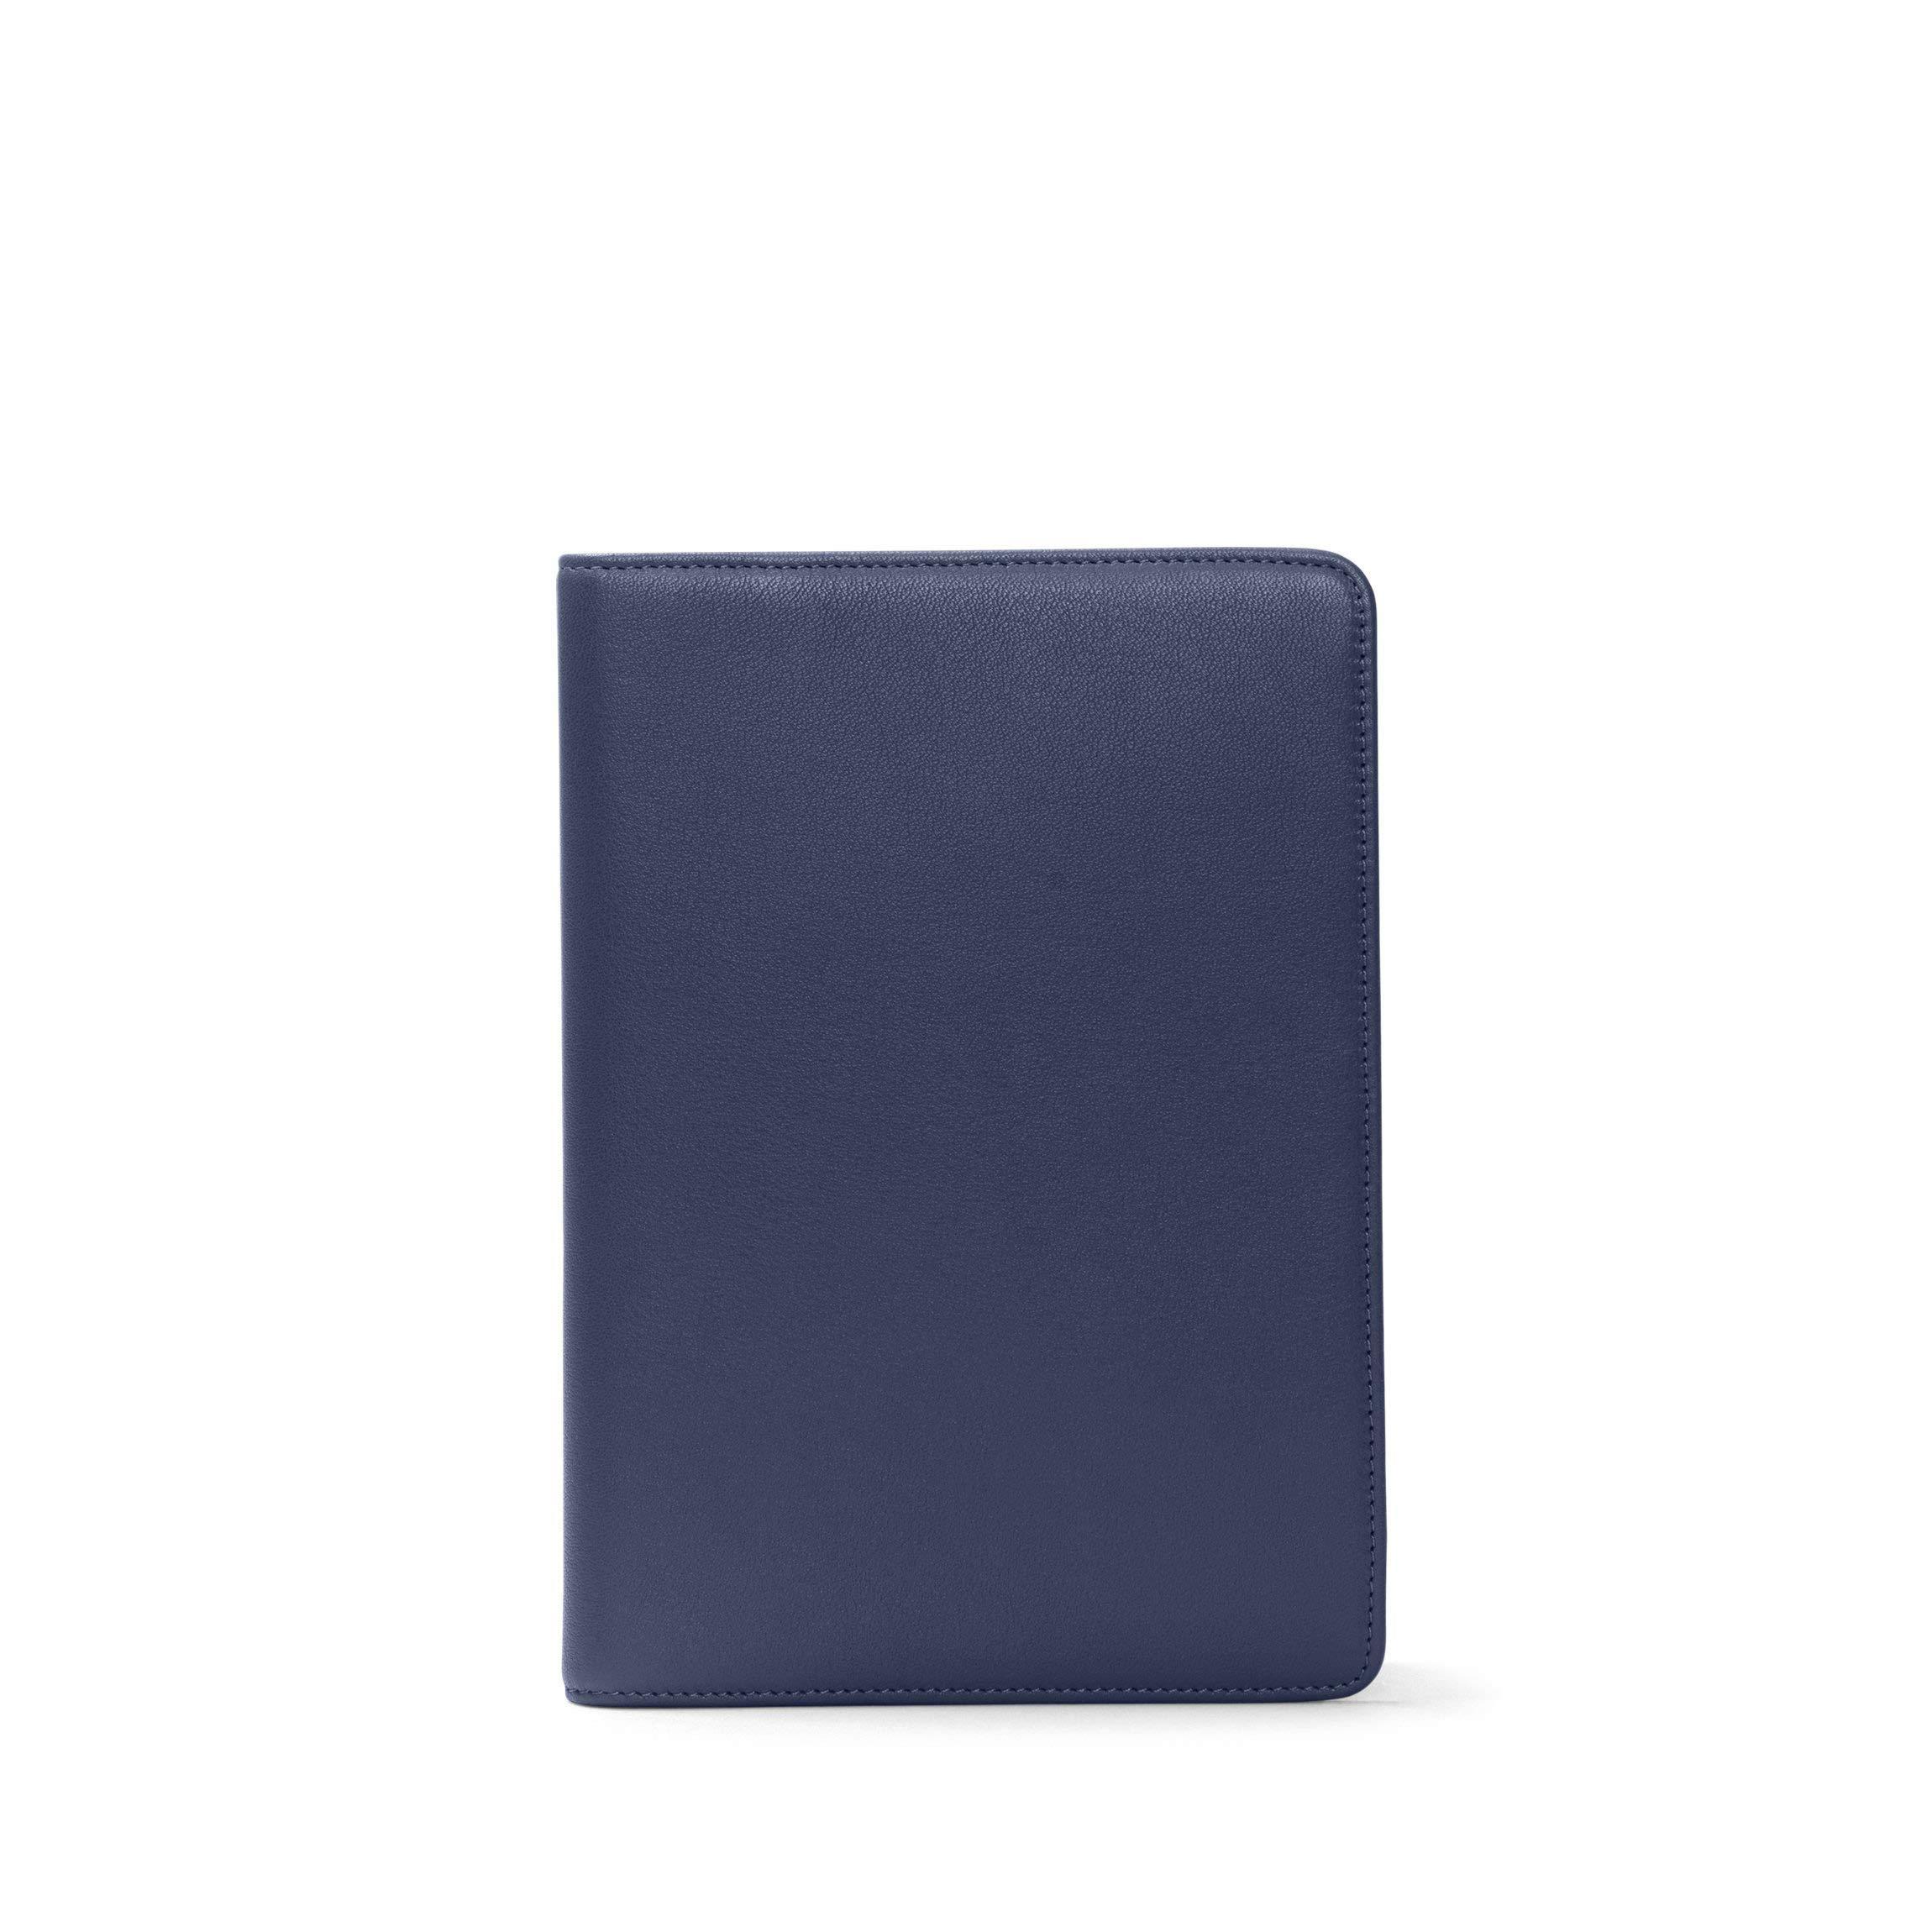 Spiral Medium Journal - Full Grain Leather Leather - Navy (blue)